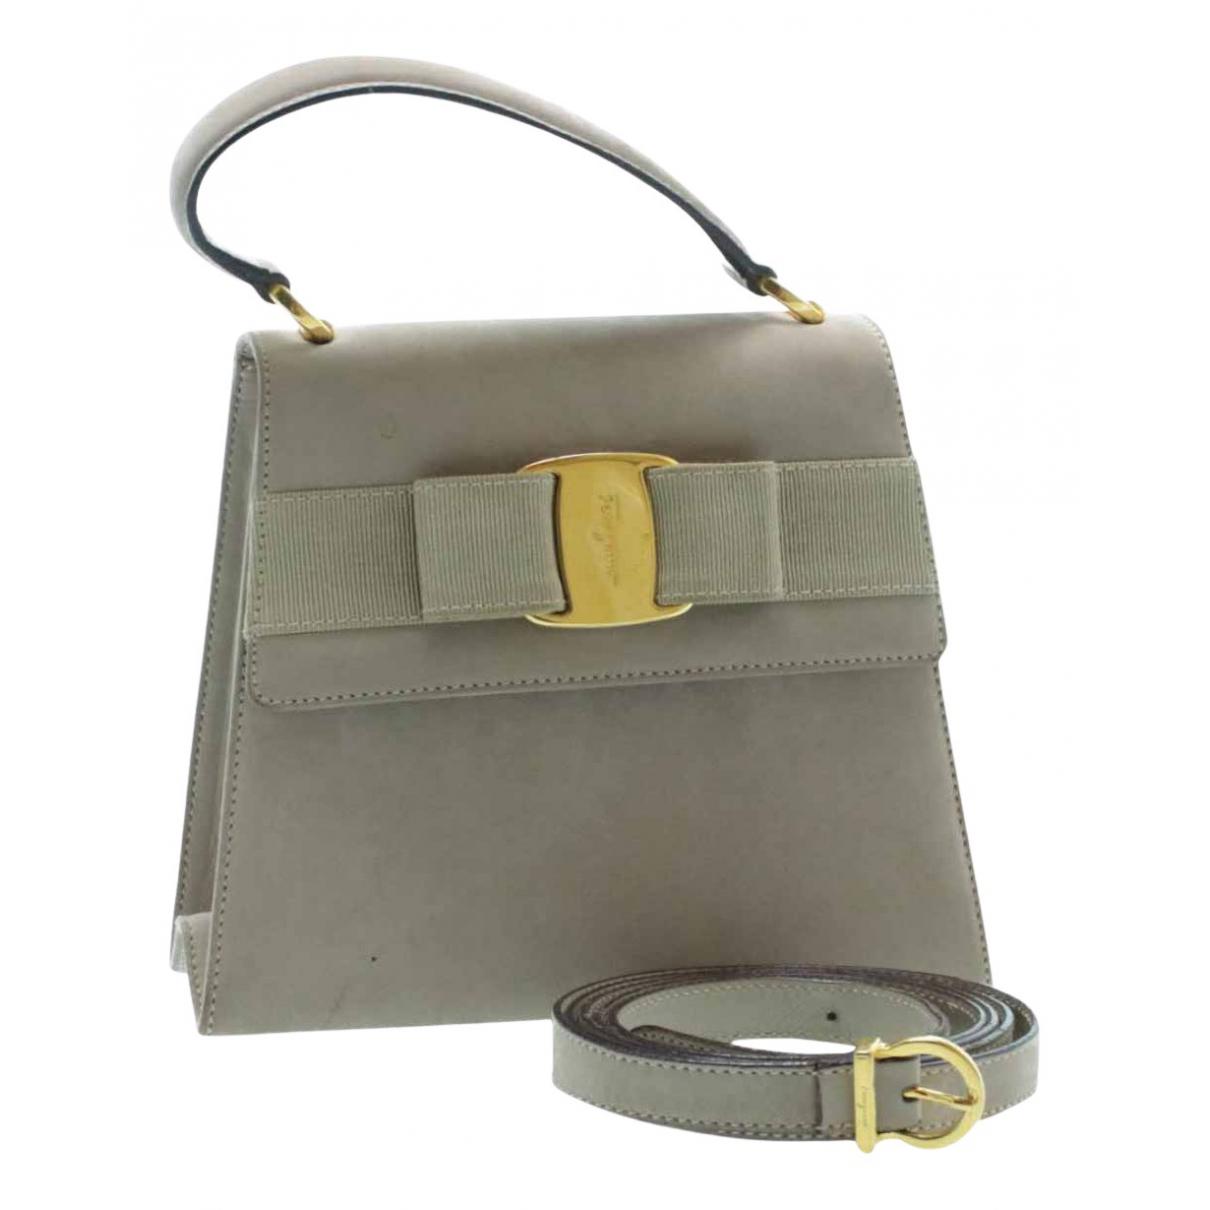 Salvatore Ferragamo \N Handtasche in  Grau Leder